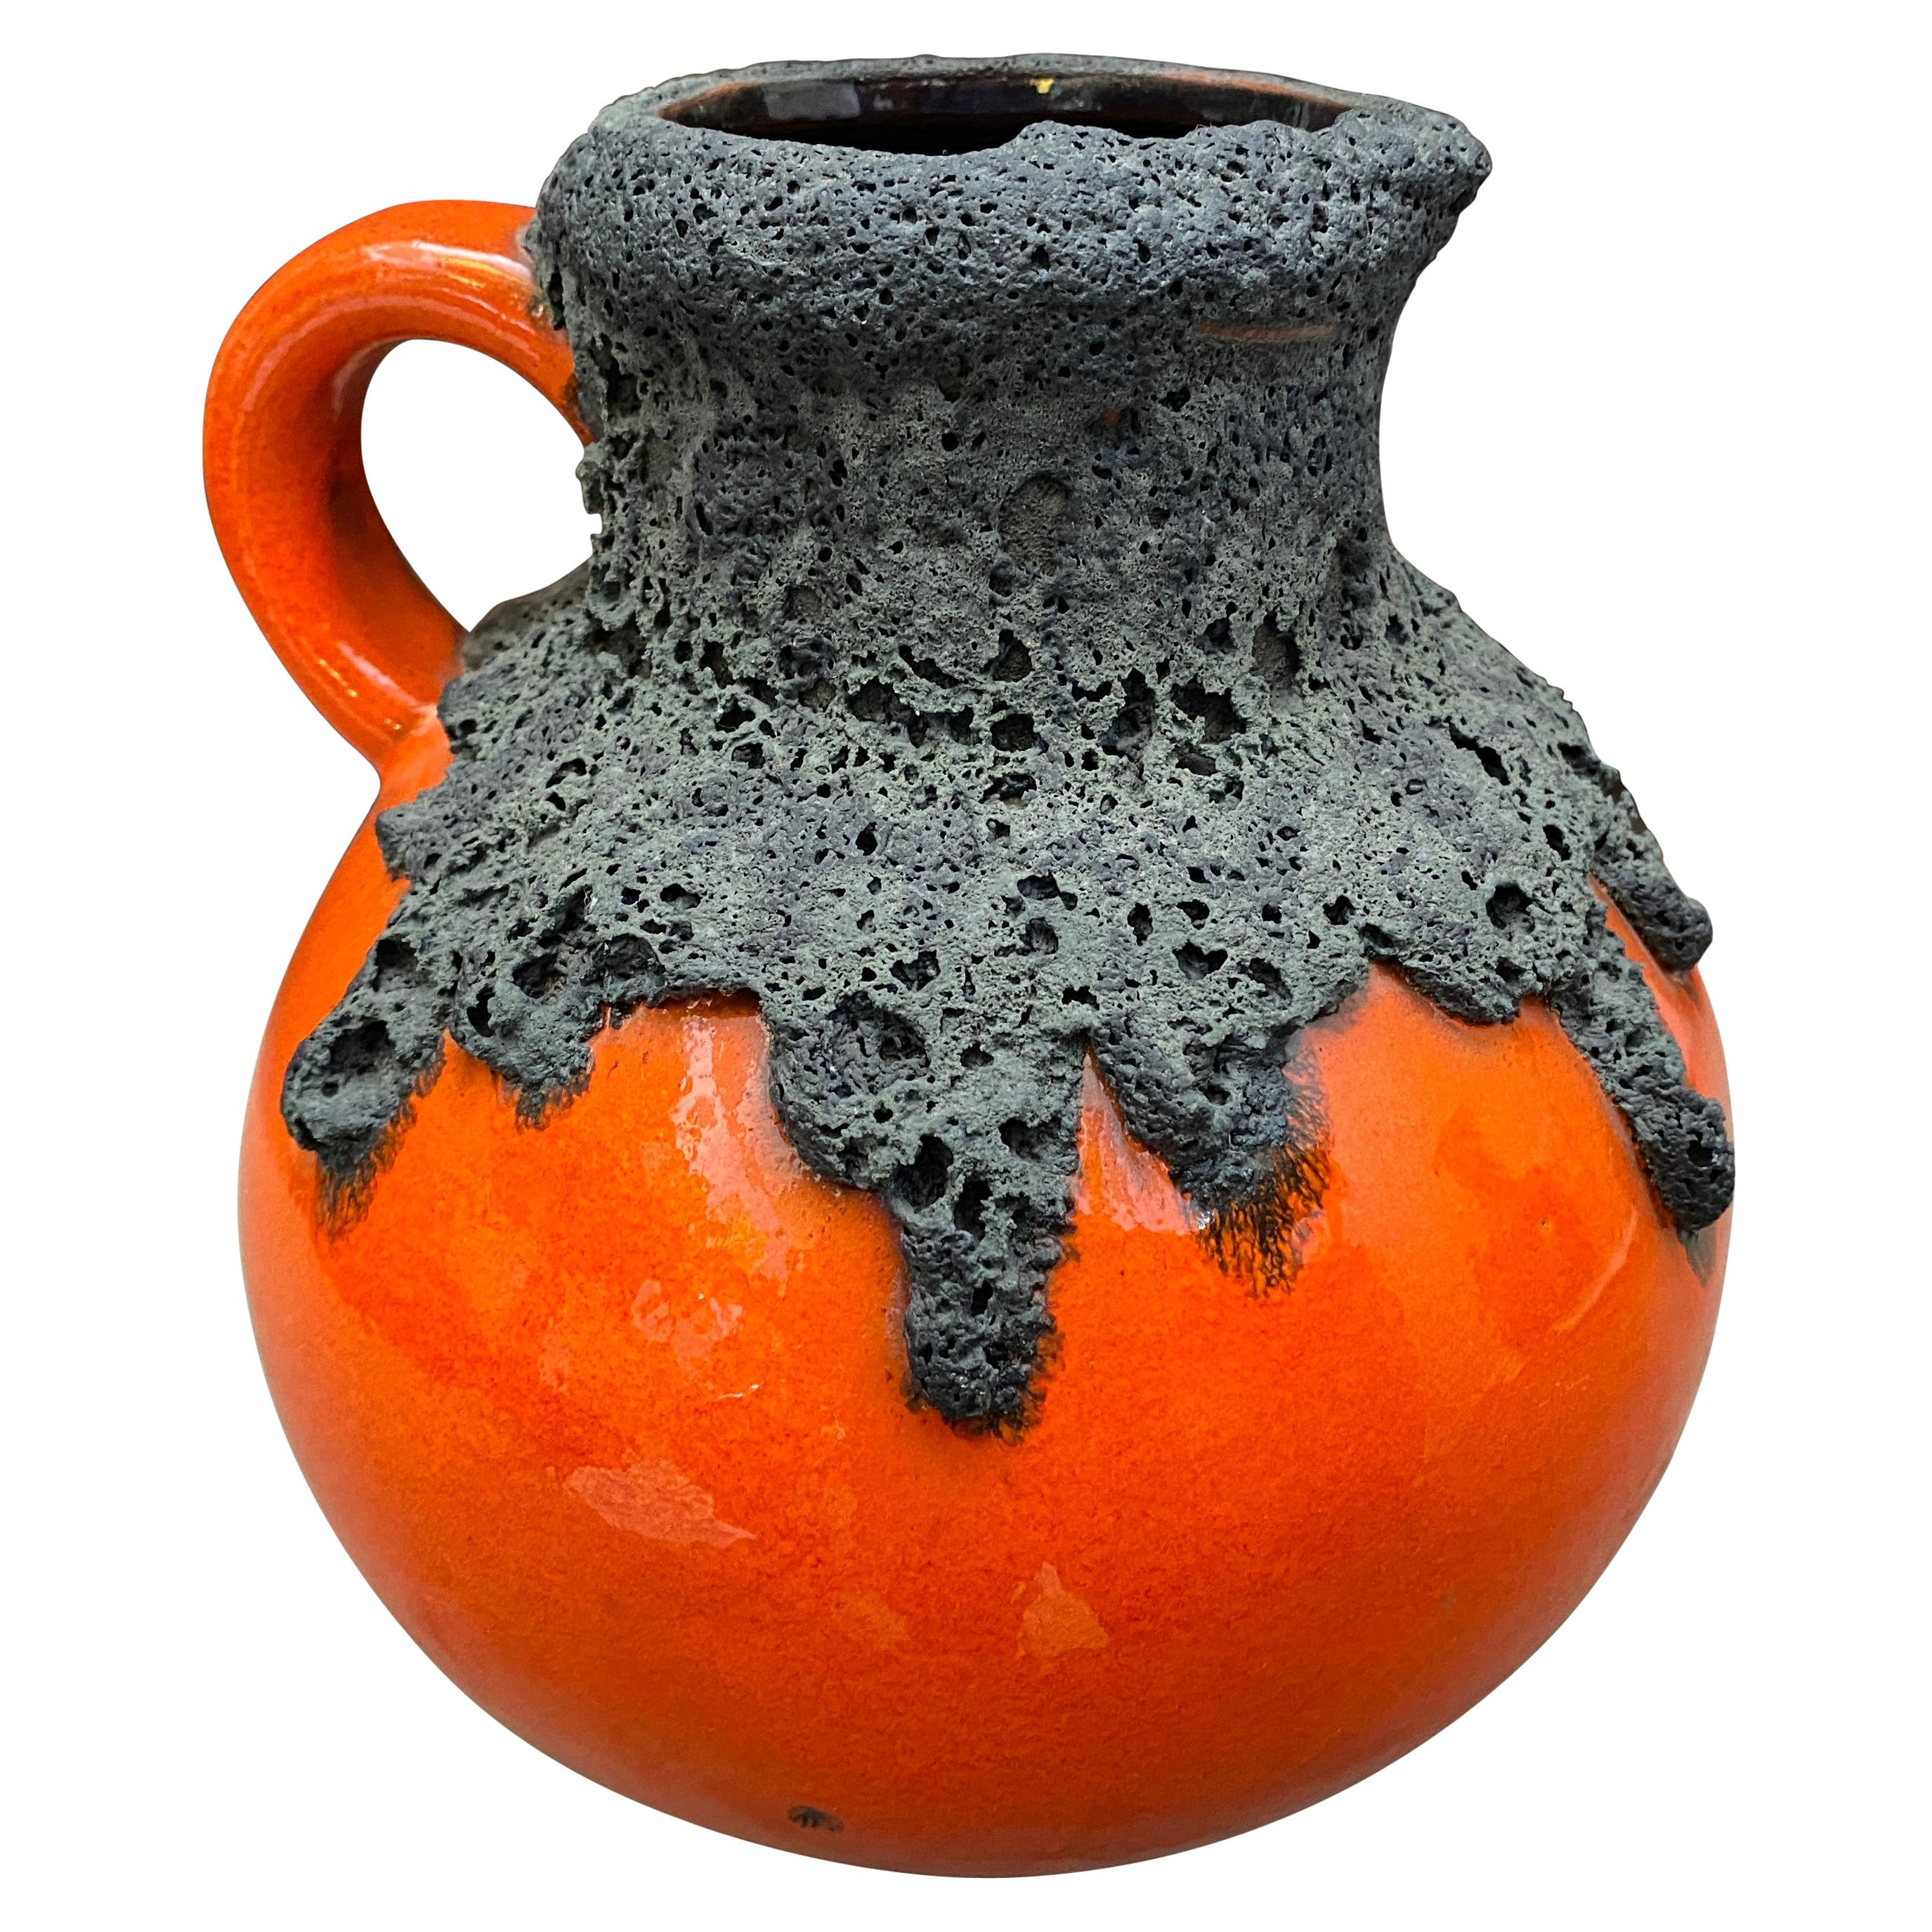 1970s Mid-Century Modern Fat Lava Ceramic German Jug Vase by Roth Keramik